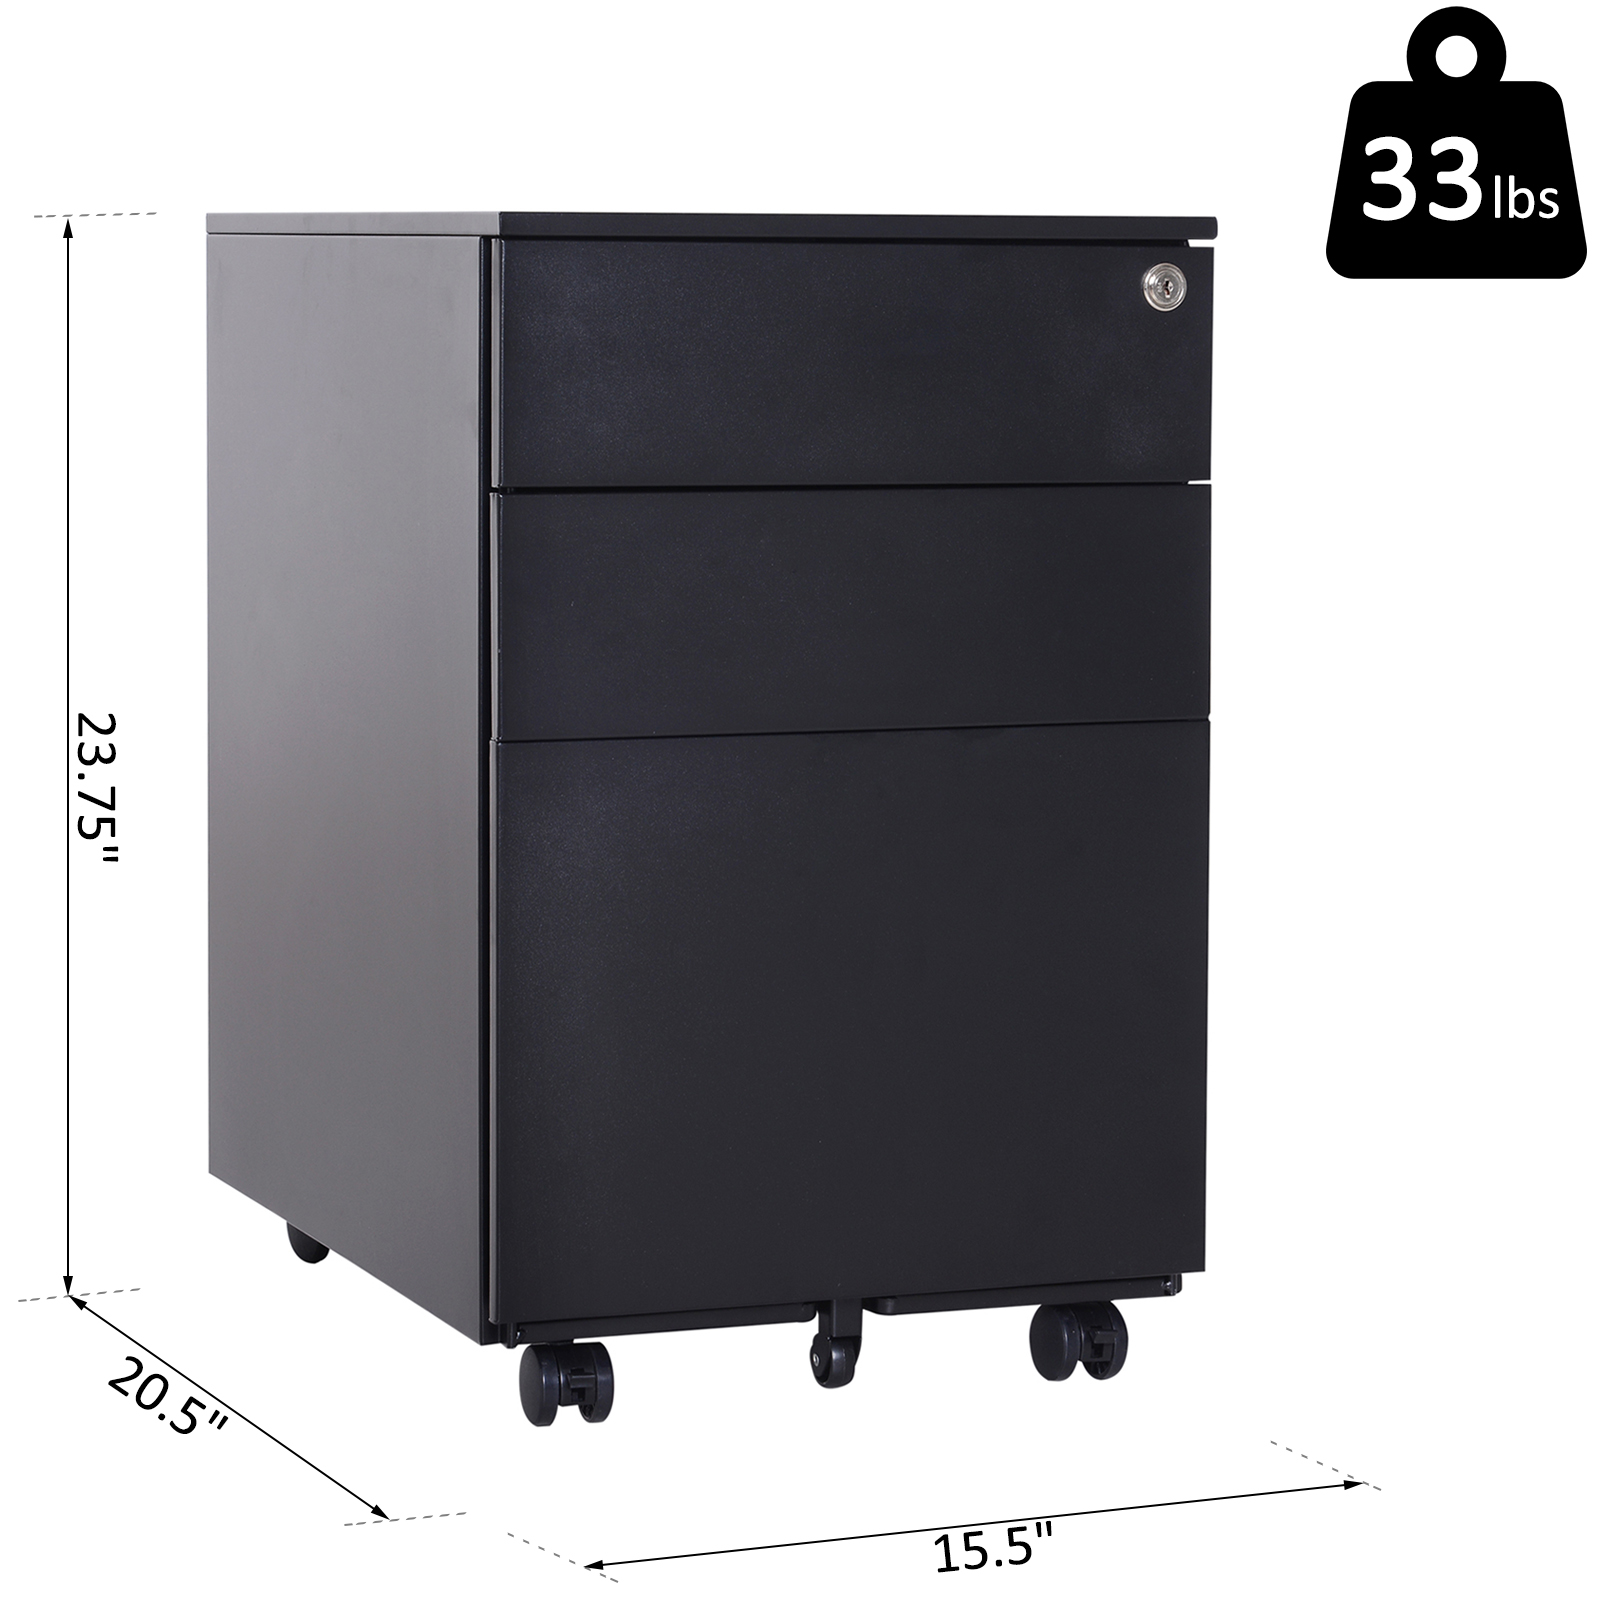 Merveilleux Vinsetto 24u0027 Metal 3 Drawer Locking Under Desk Filing Cabinet On Wheels    Black